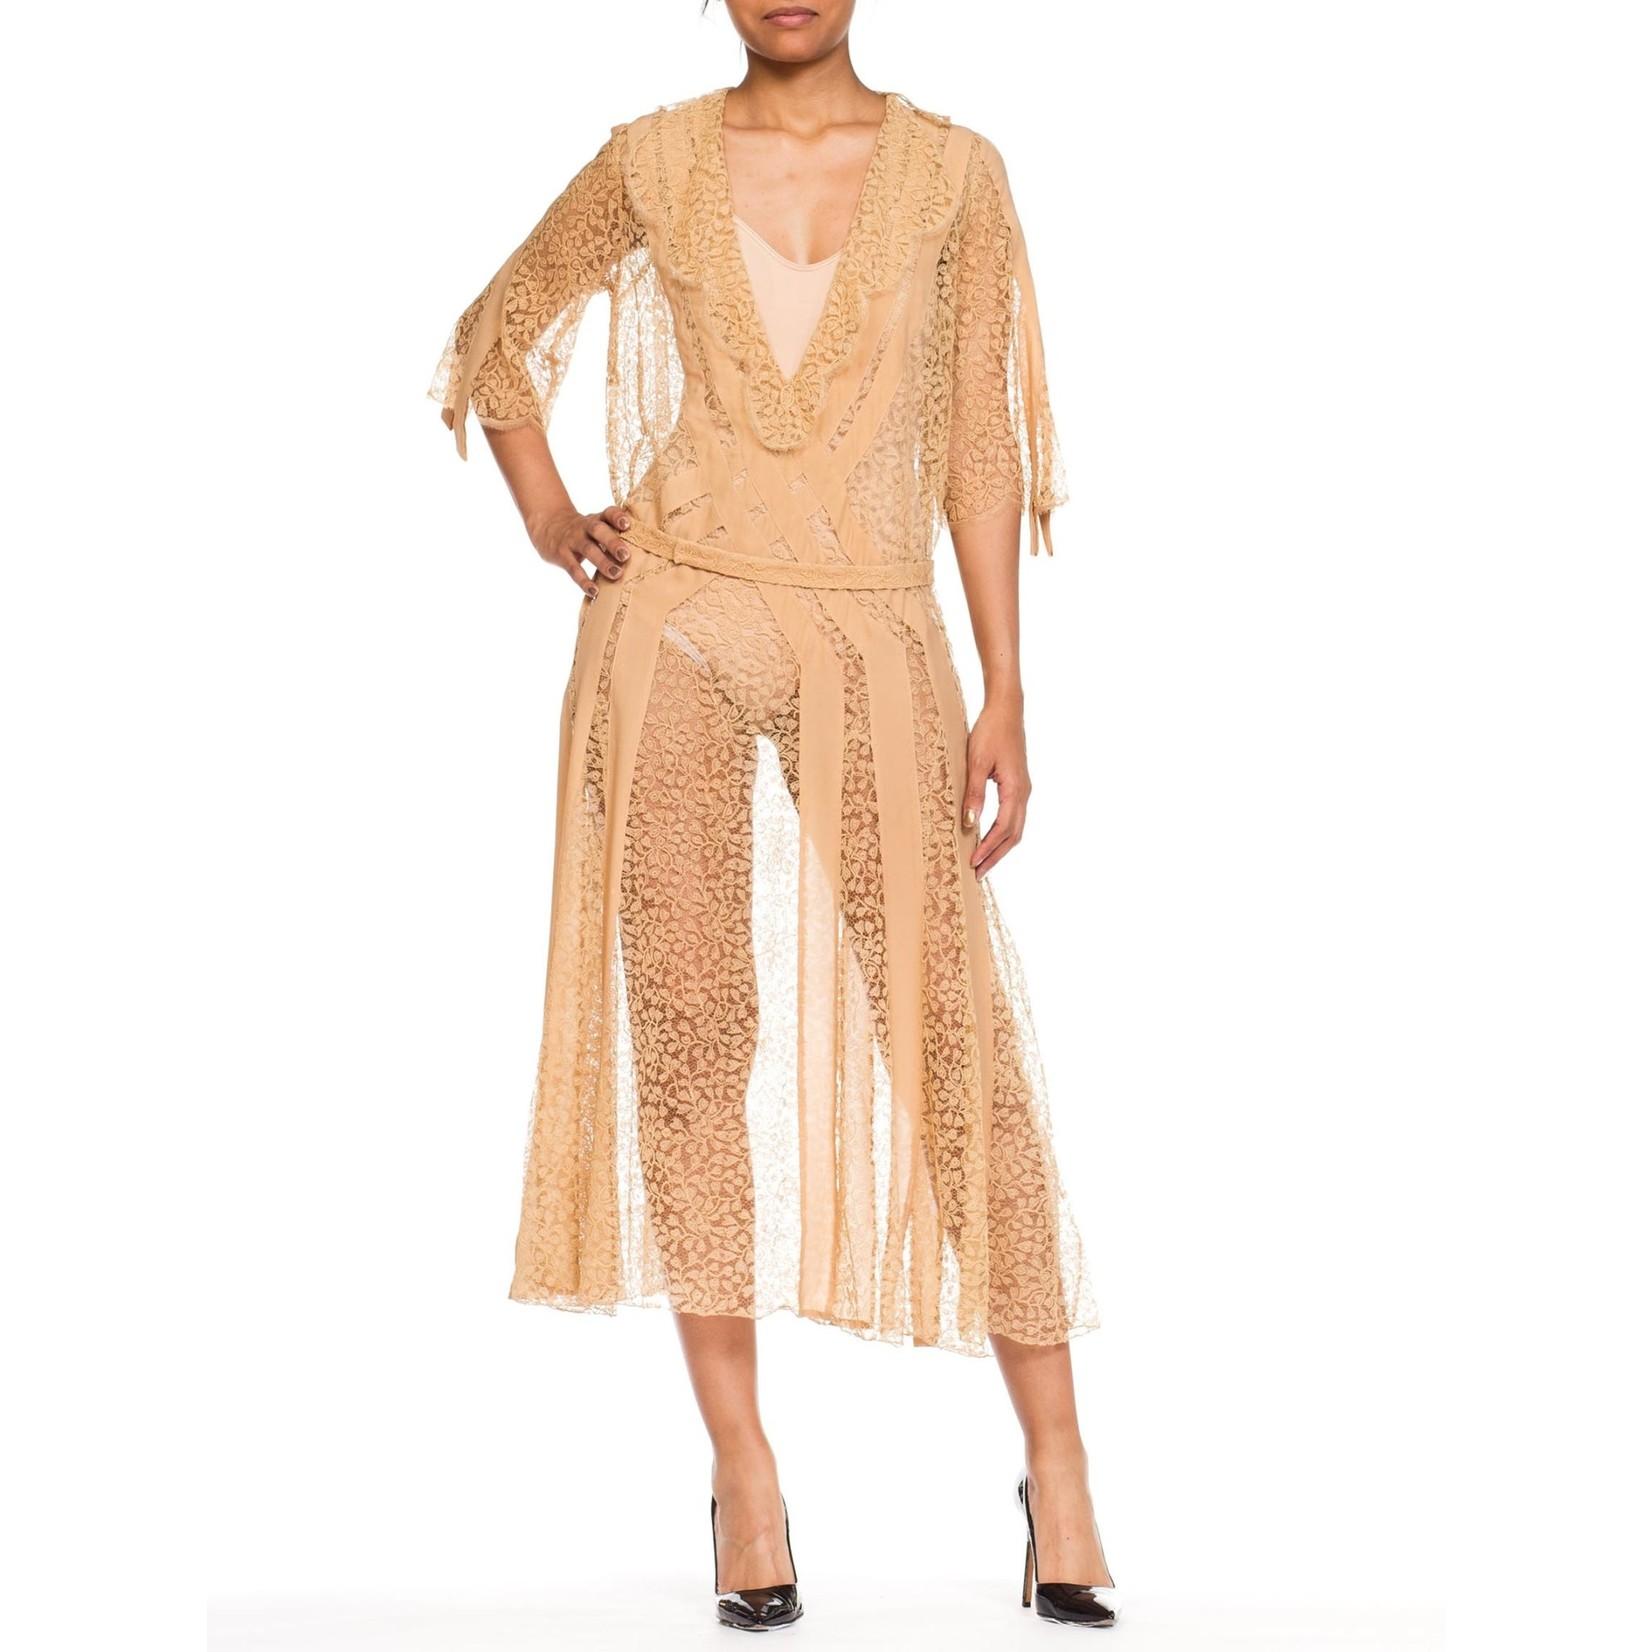 Wyld Blue Vintage 1920s Beige Silk & Lace Dress With Art Deco Appliqué Design & Slip, XL